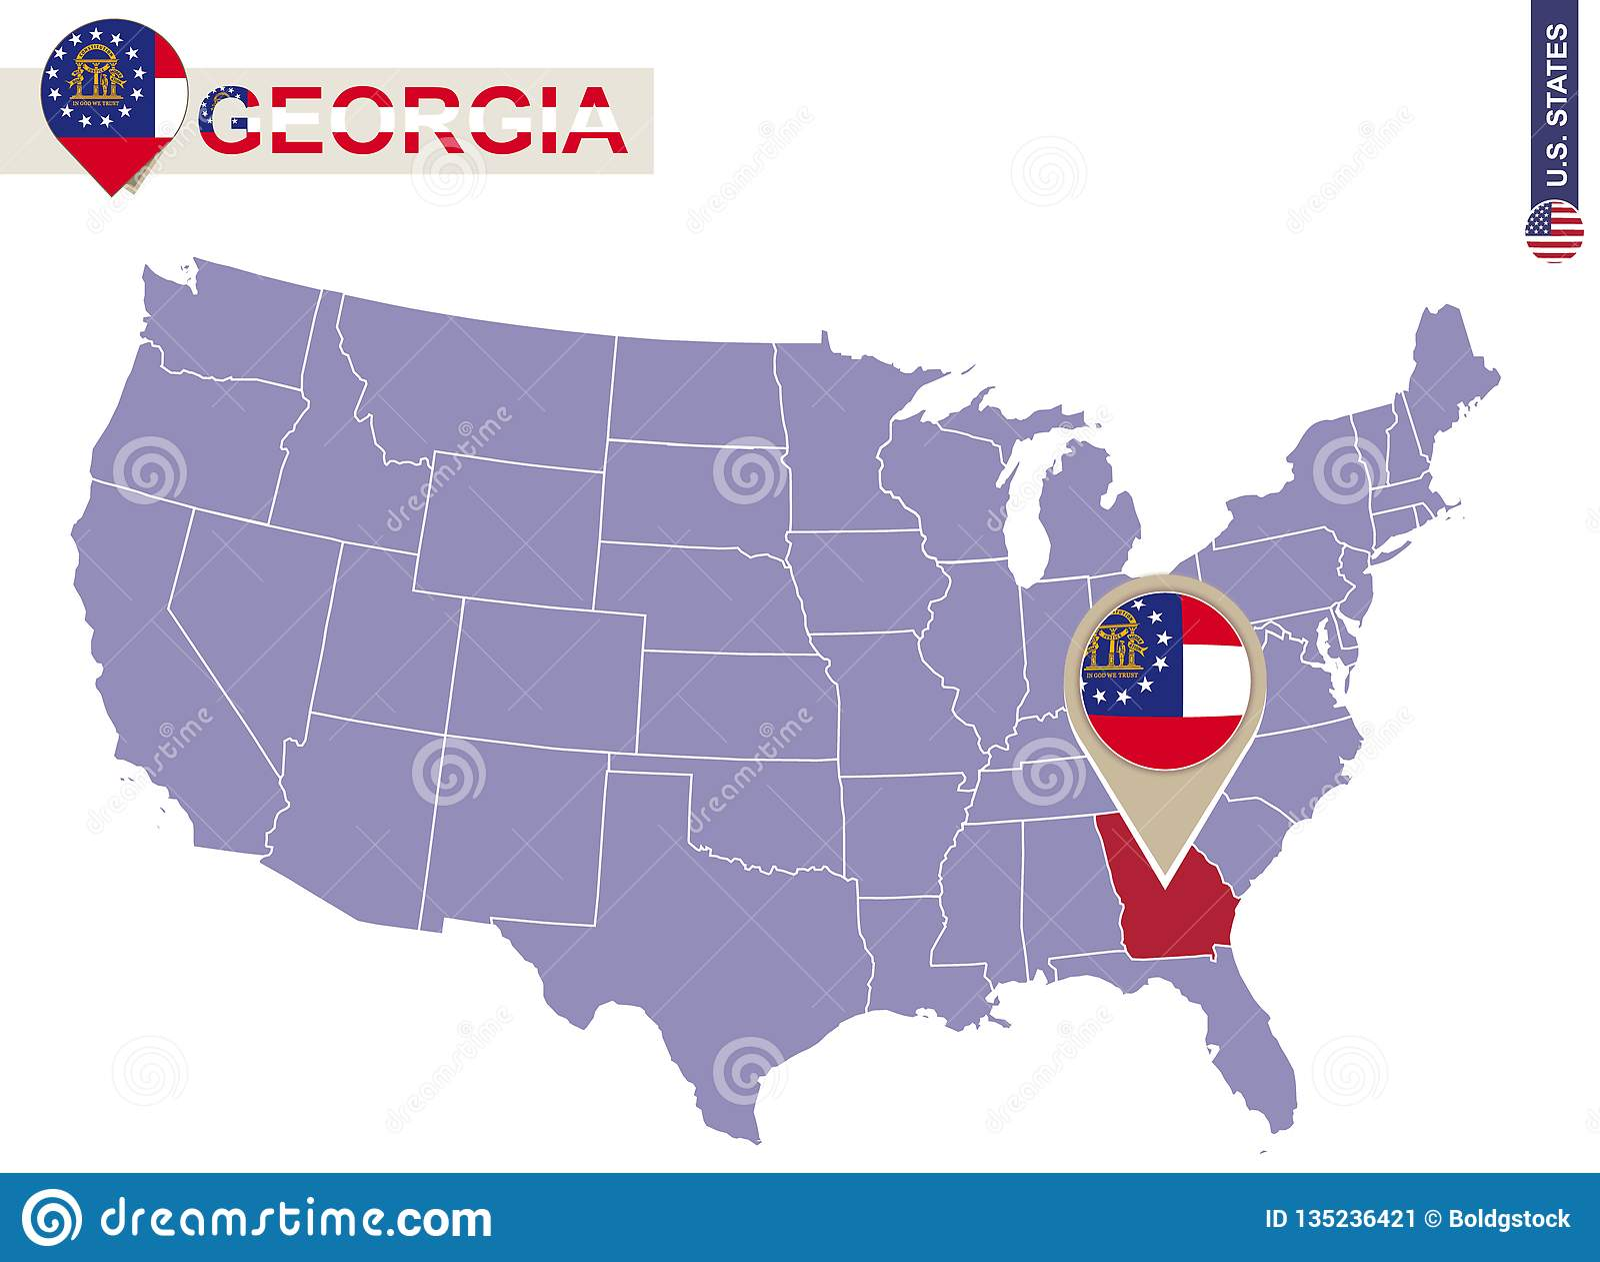 Georgia State On USA Map. Georgia Flag And Map Stock Vector ... on nebraska map usa, alabama map usa, wisconsin map usa, missouri map usa, columbia map usa, iowa map usa, mississippi map usa, yale map usa, houston map usa, connecticut map usa, tulsa map usa, indiana map usa, california map usa, colorado map usa, akron map usa, oklahoma map usa, evansville map usa, kentucky map usa, michigan map usa, minnesota map usa,